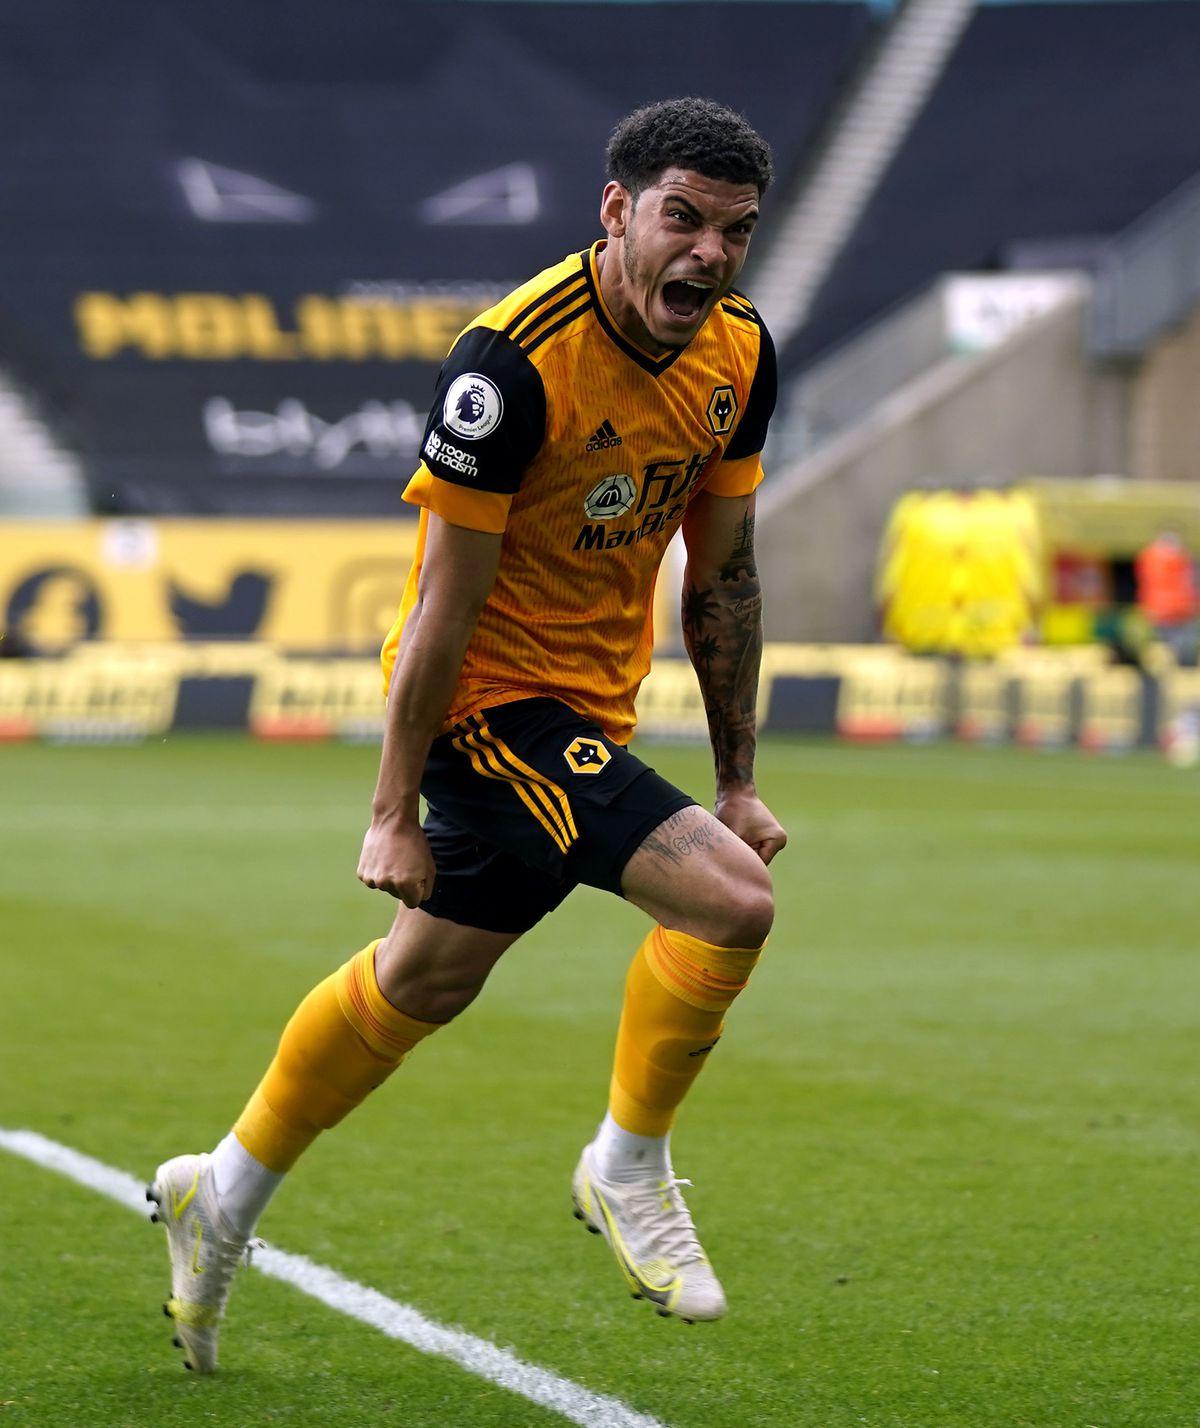 Wolverhampton Wanderers' Morgan Gibbs-White celebrates